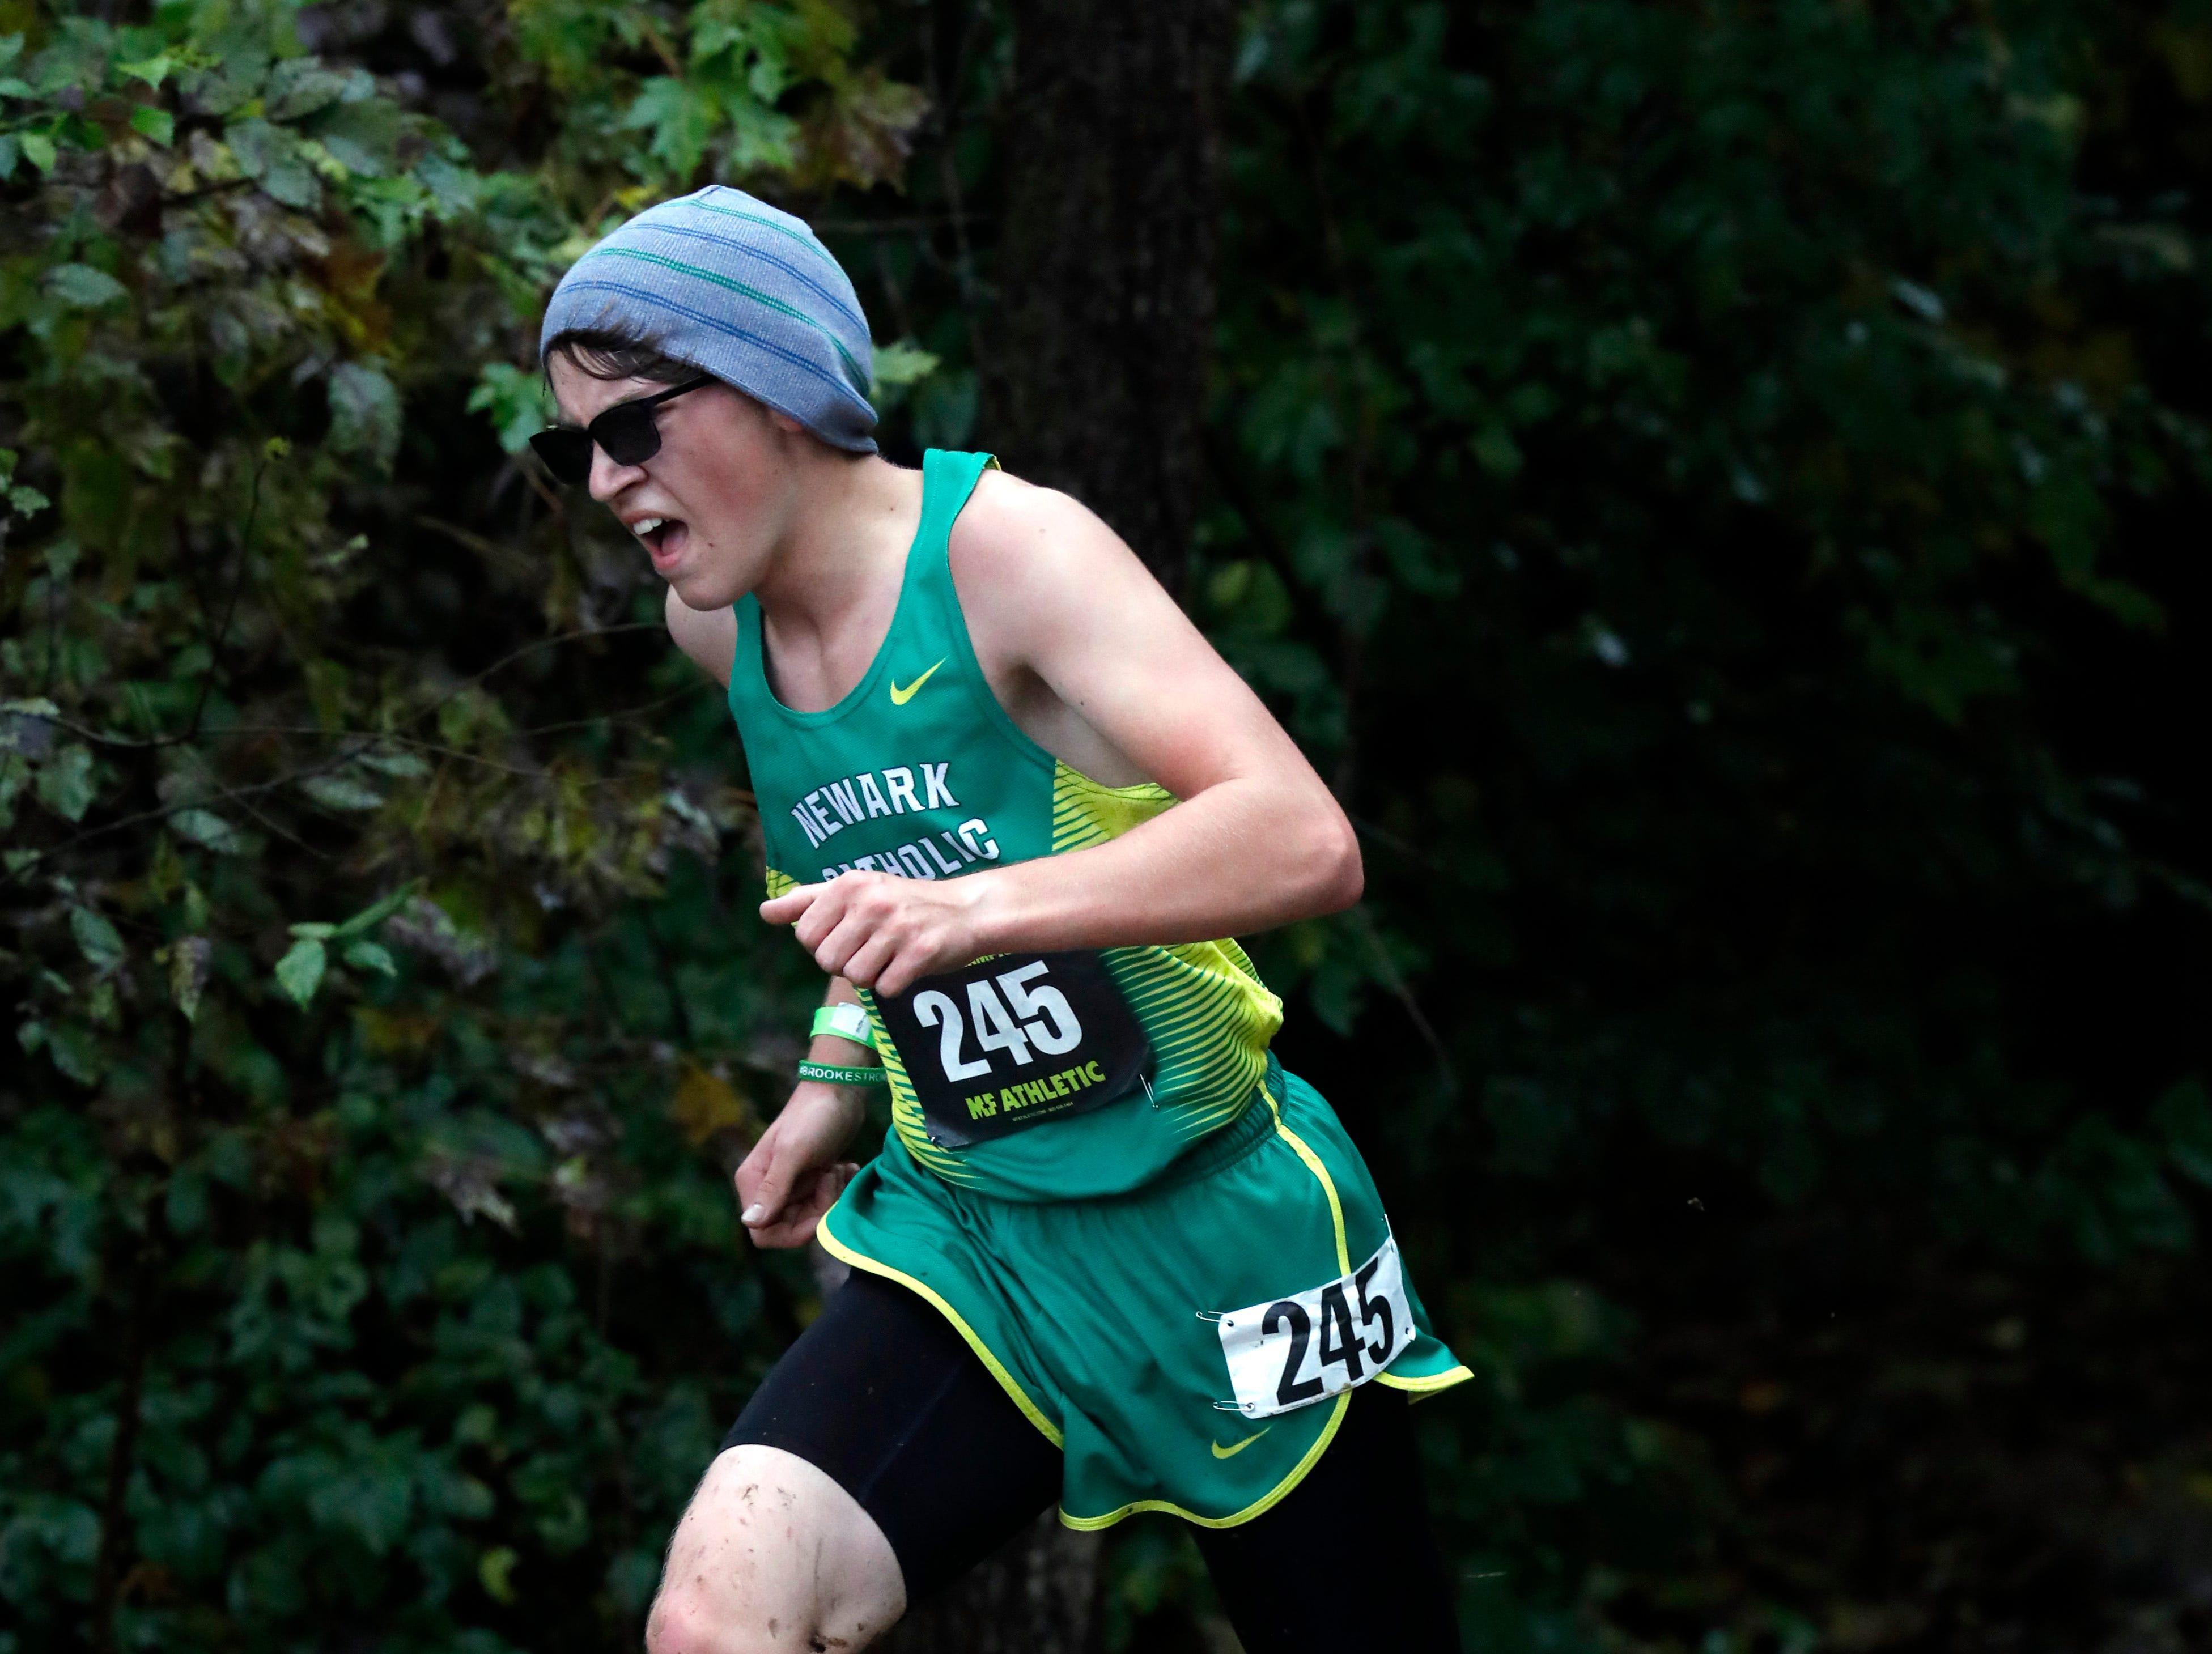 Newark Catholic's Andy Bemis runs in the Regional Cross Country meet Saturday, Oct. 27, 2018, at Pickerington North High School in Pickerington.